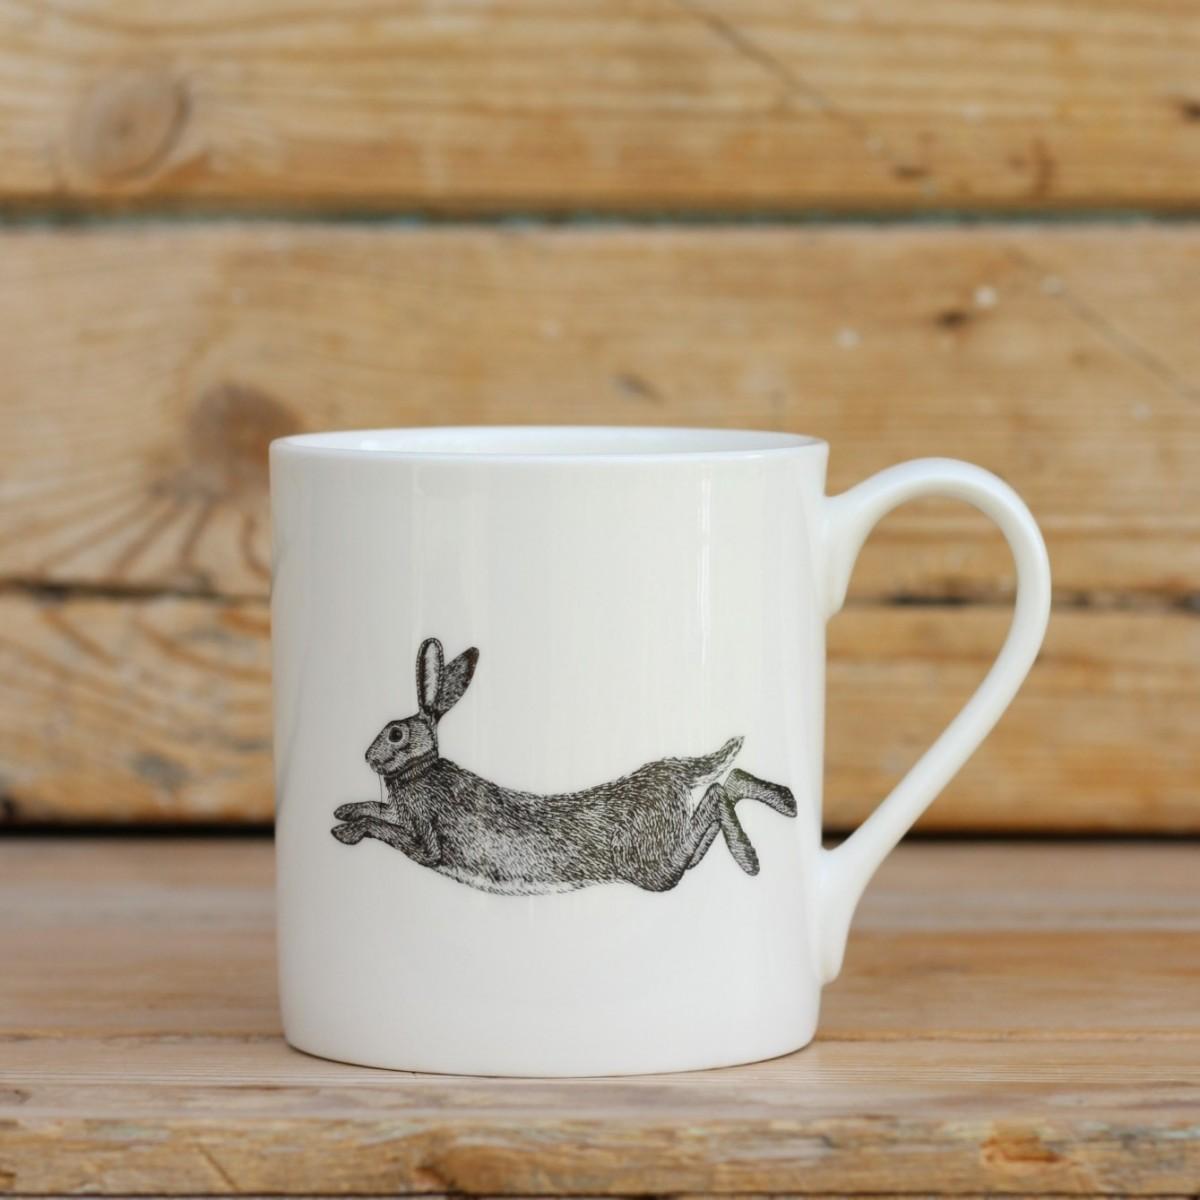 Hare Bone China Mug